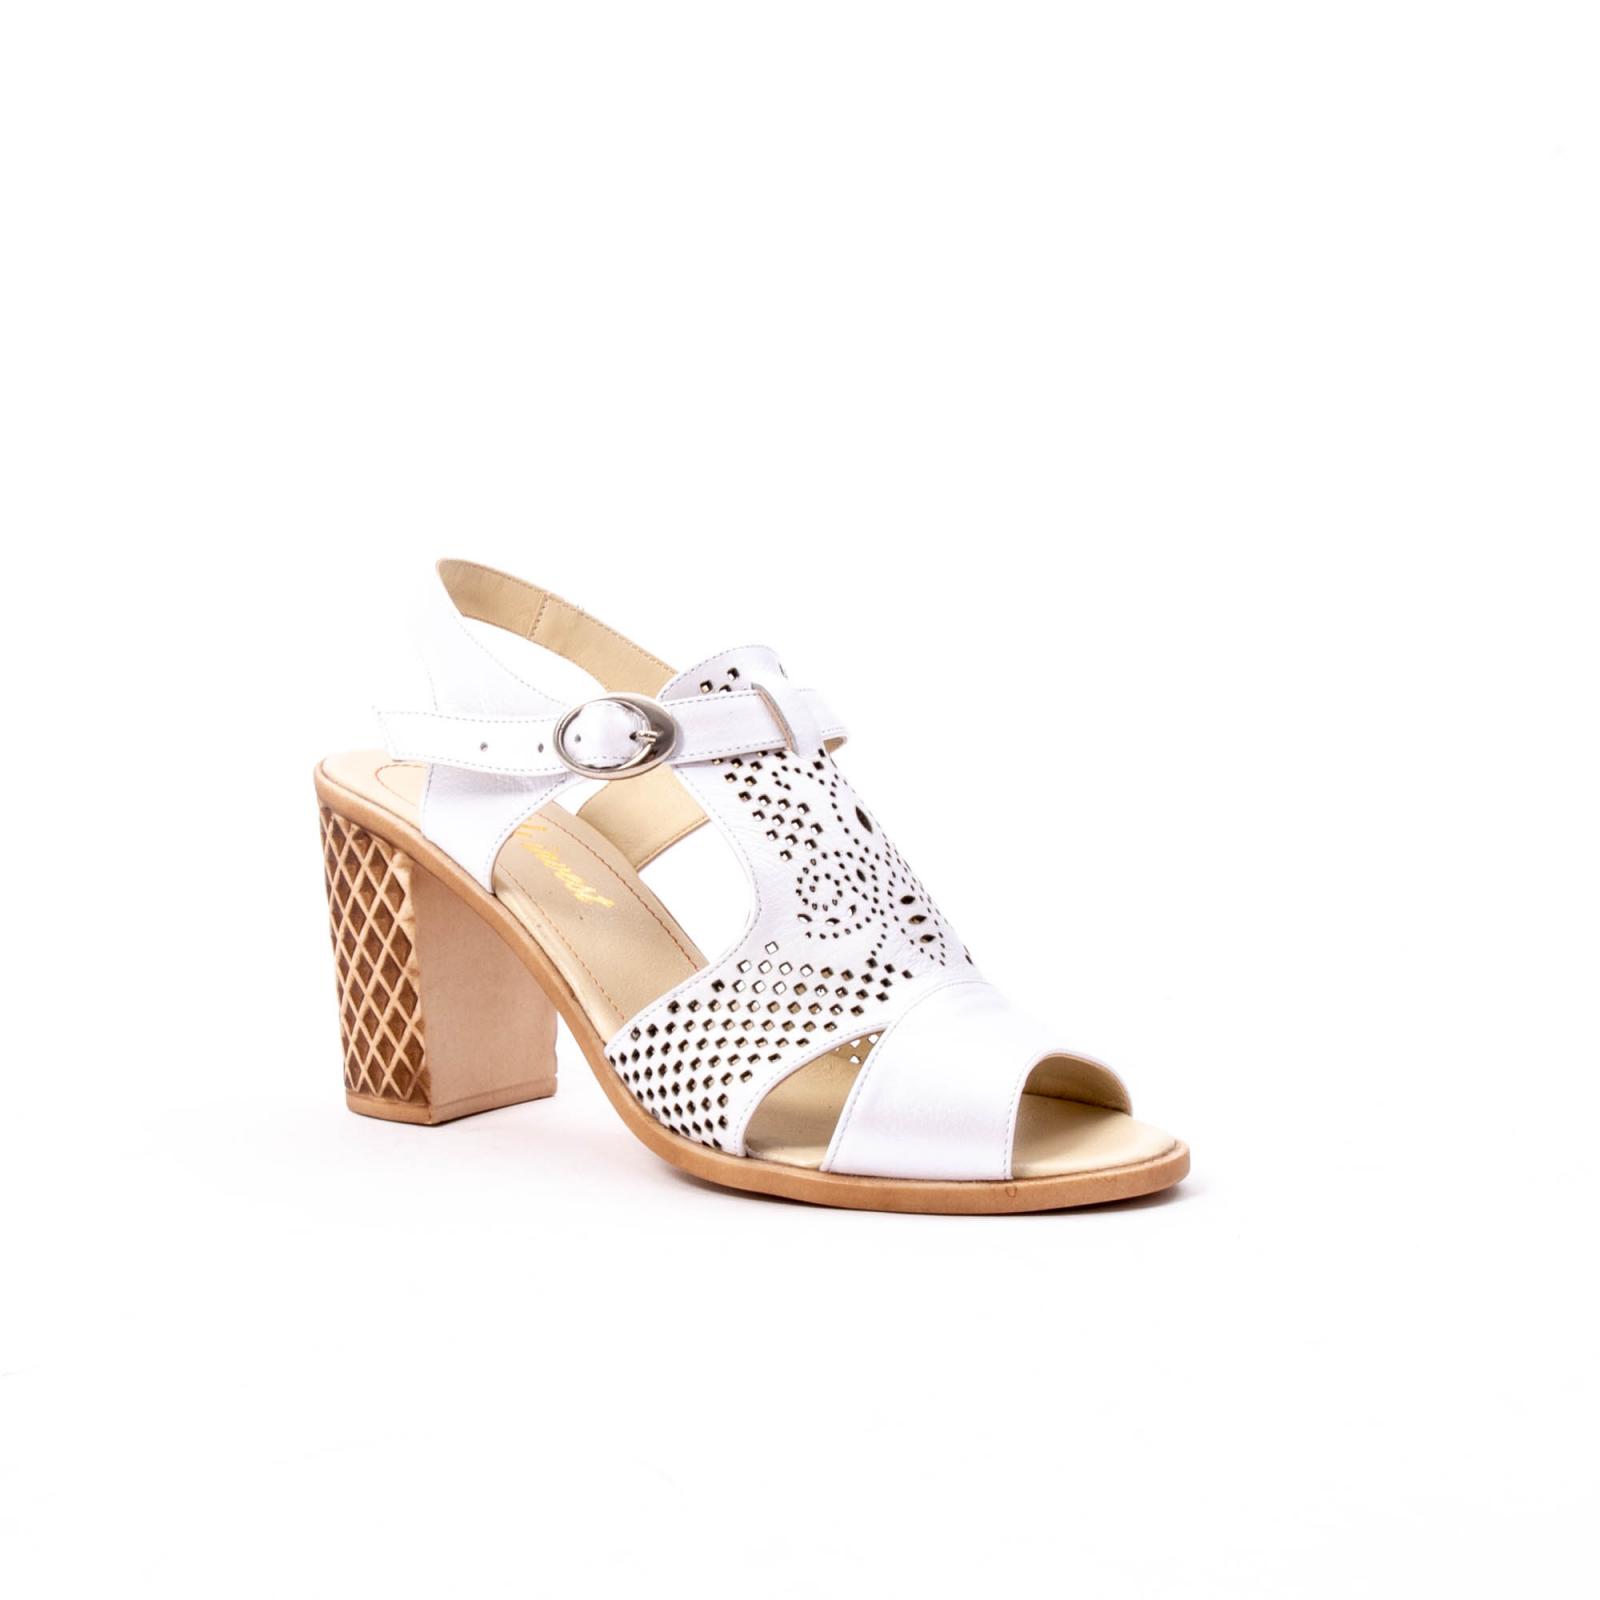 Nk238Alb NaturalaNike Sandale Dama ElegantePiele Invest qVUSzMp